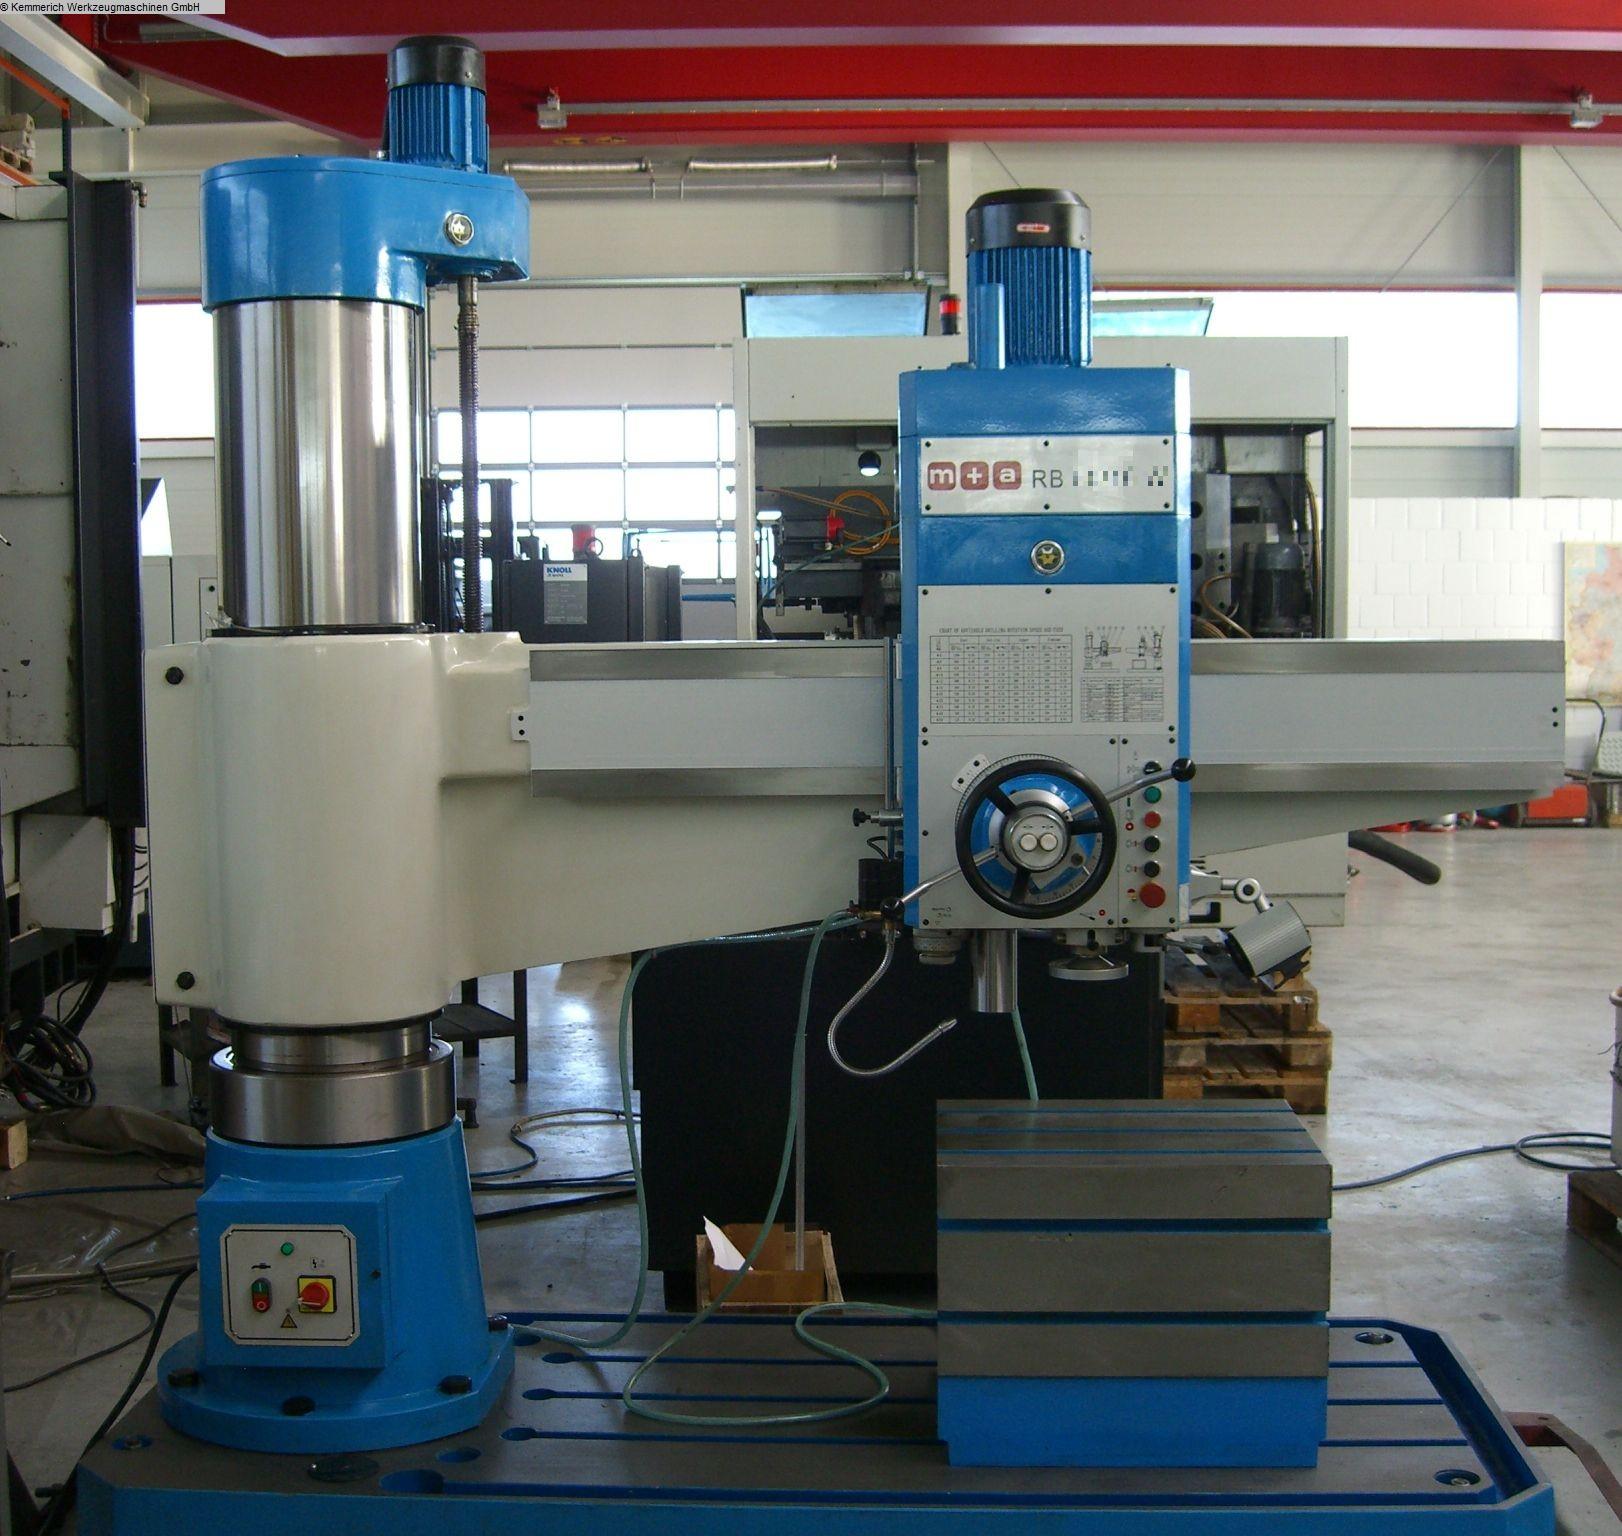 Aléseuses / Centres d'usinage / Perceuses d'occasion Perceuse radiale M + A RB 63 / 20